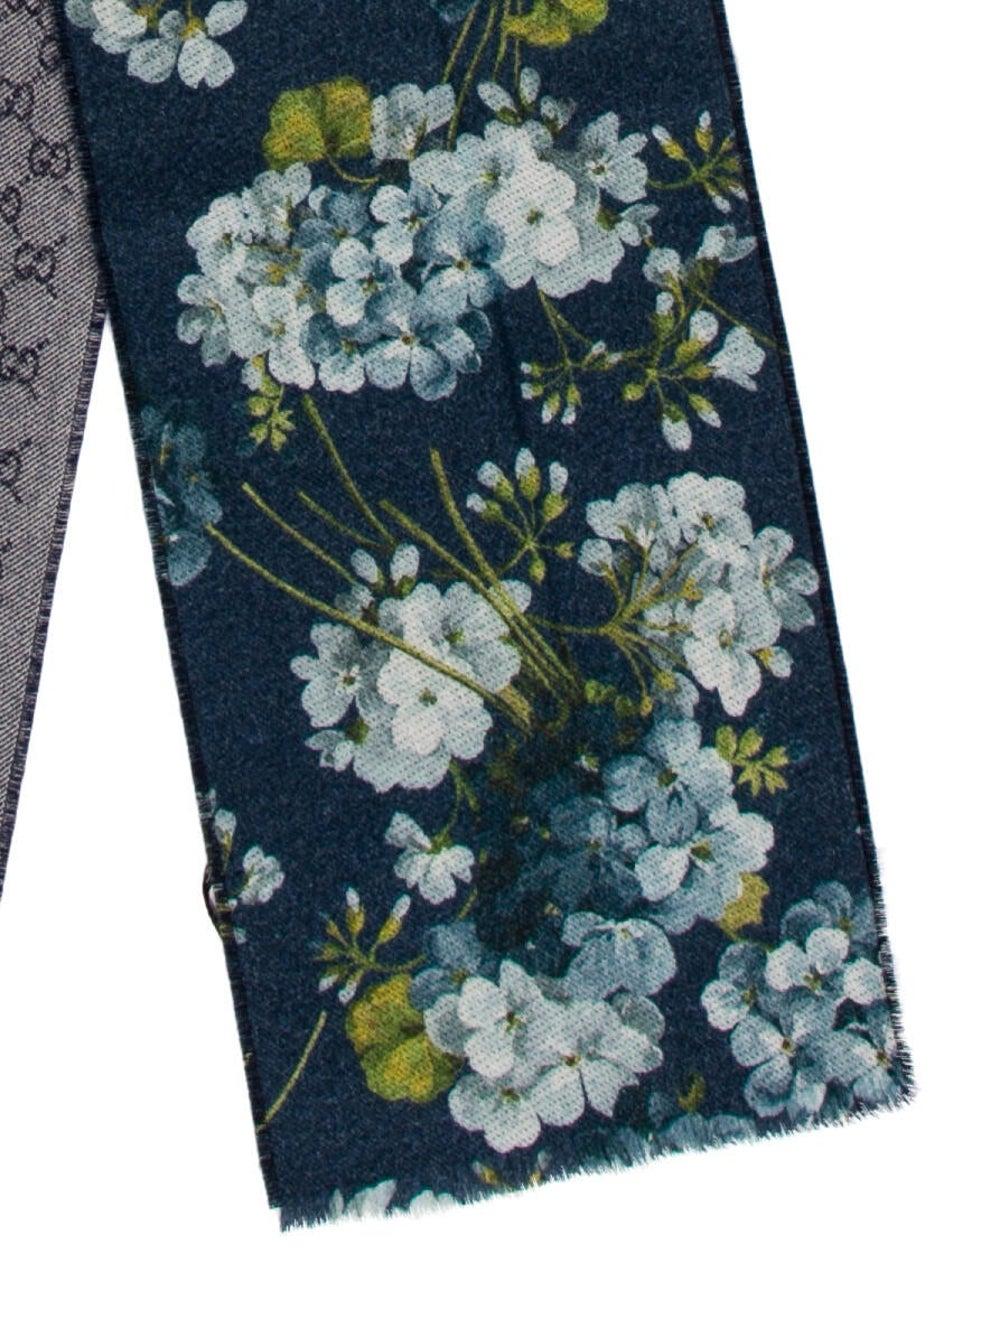 Gucci Wool Floral Print Scarf Wool - image 2